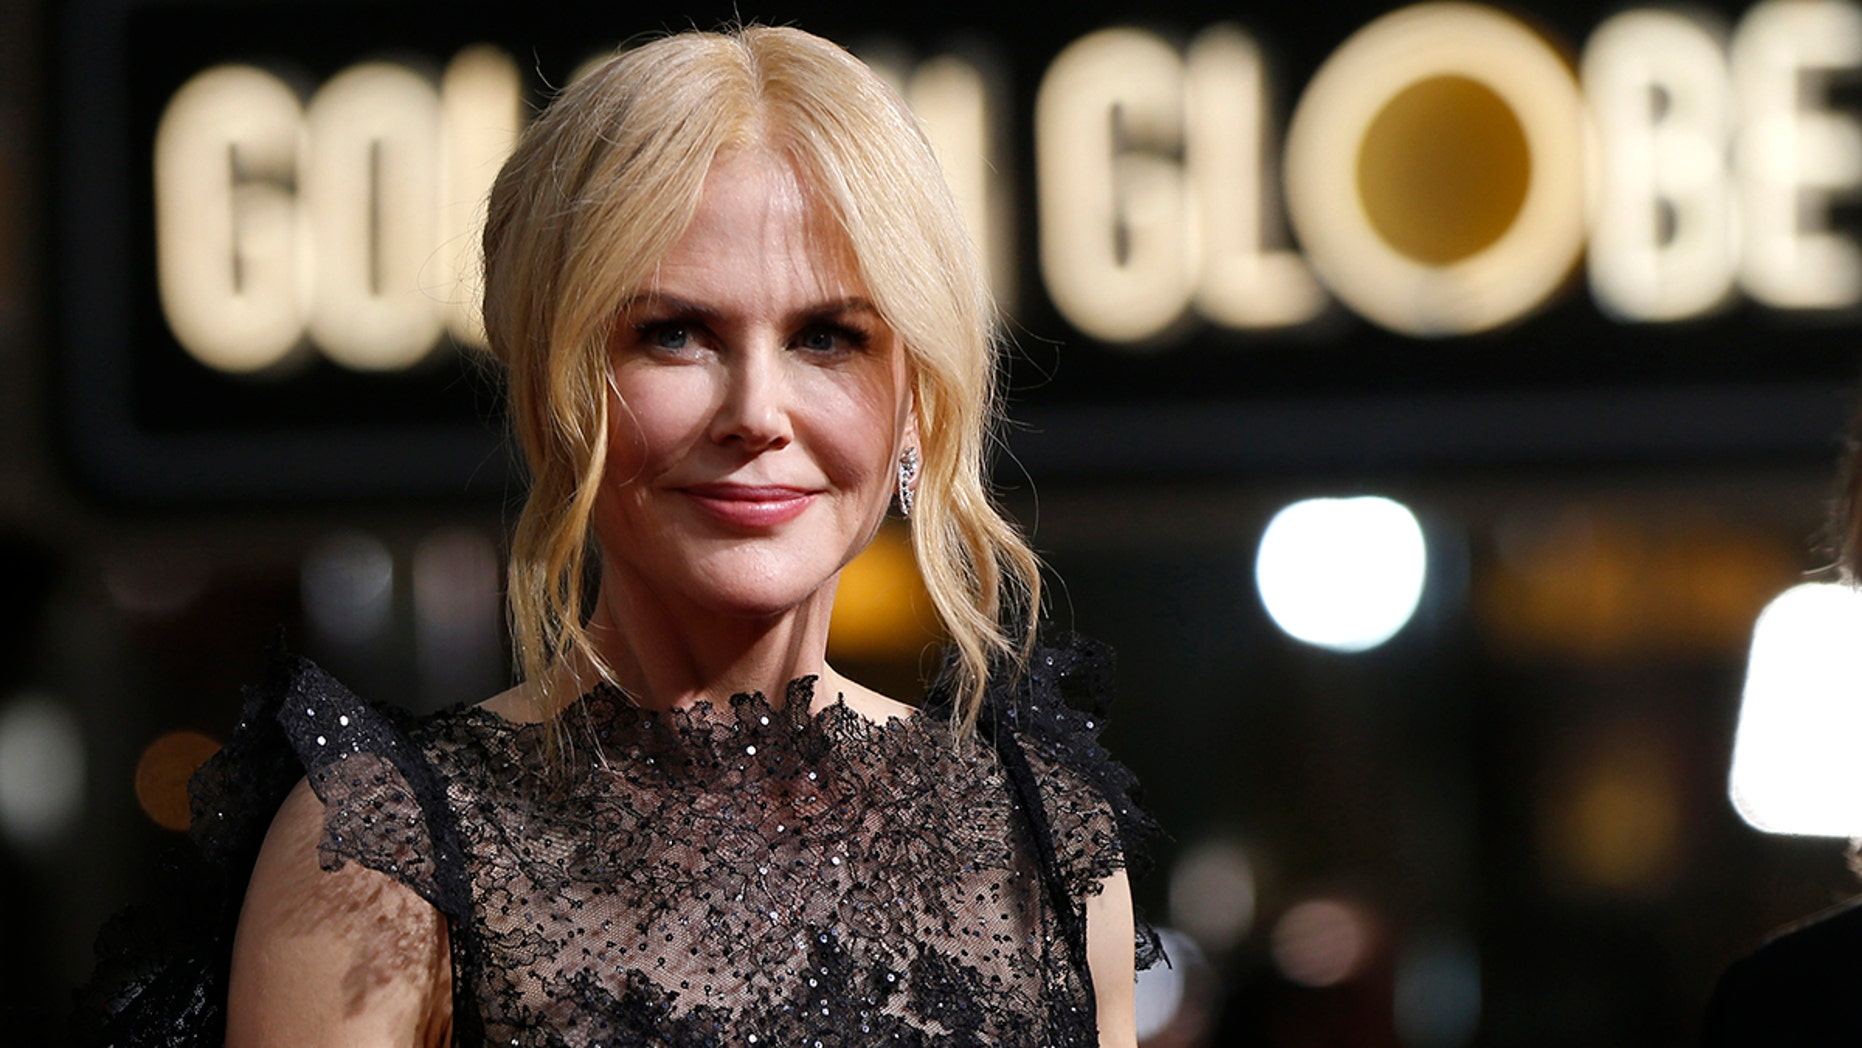 Nicole Kidman shut down a question during an event for the Toronto Film Festival.